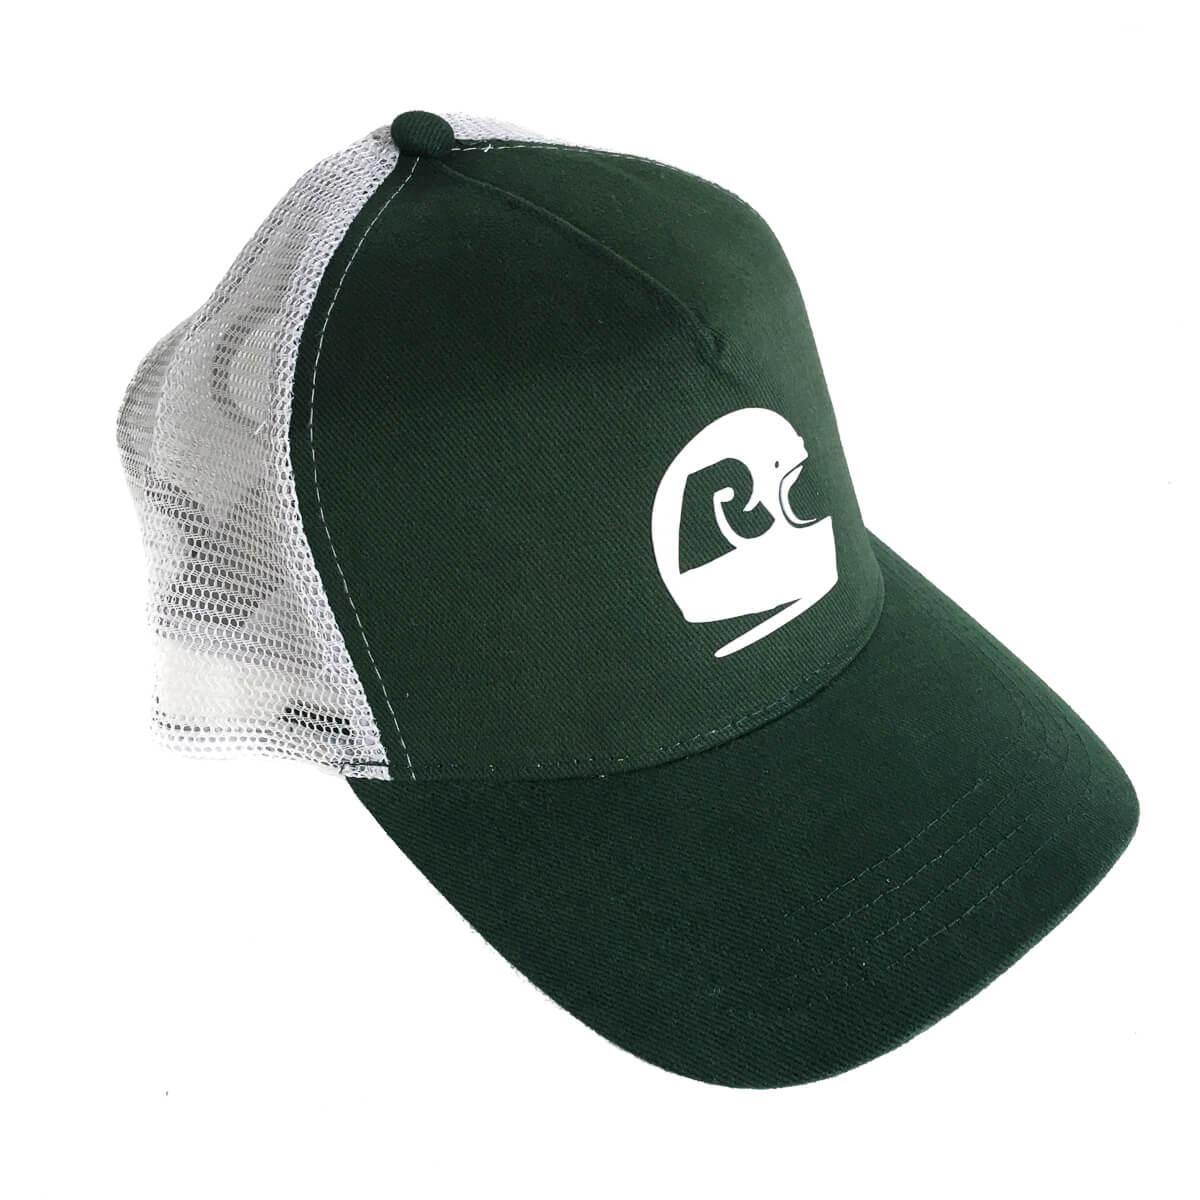 Green-Helmet-Cap-IMG_8977